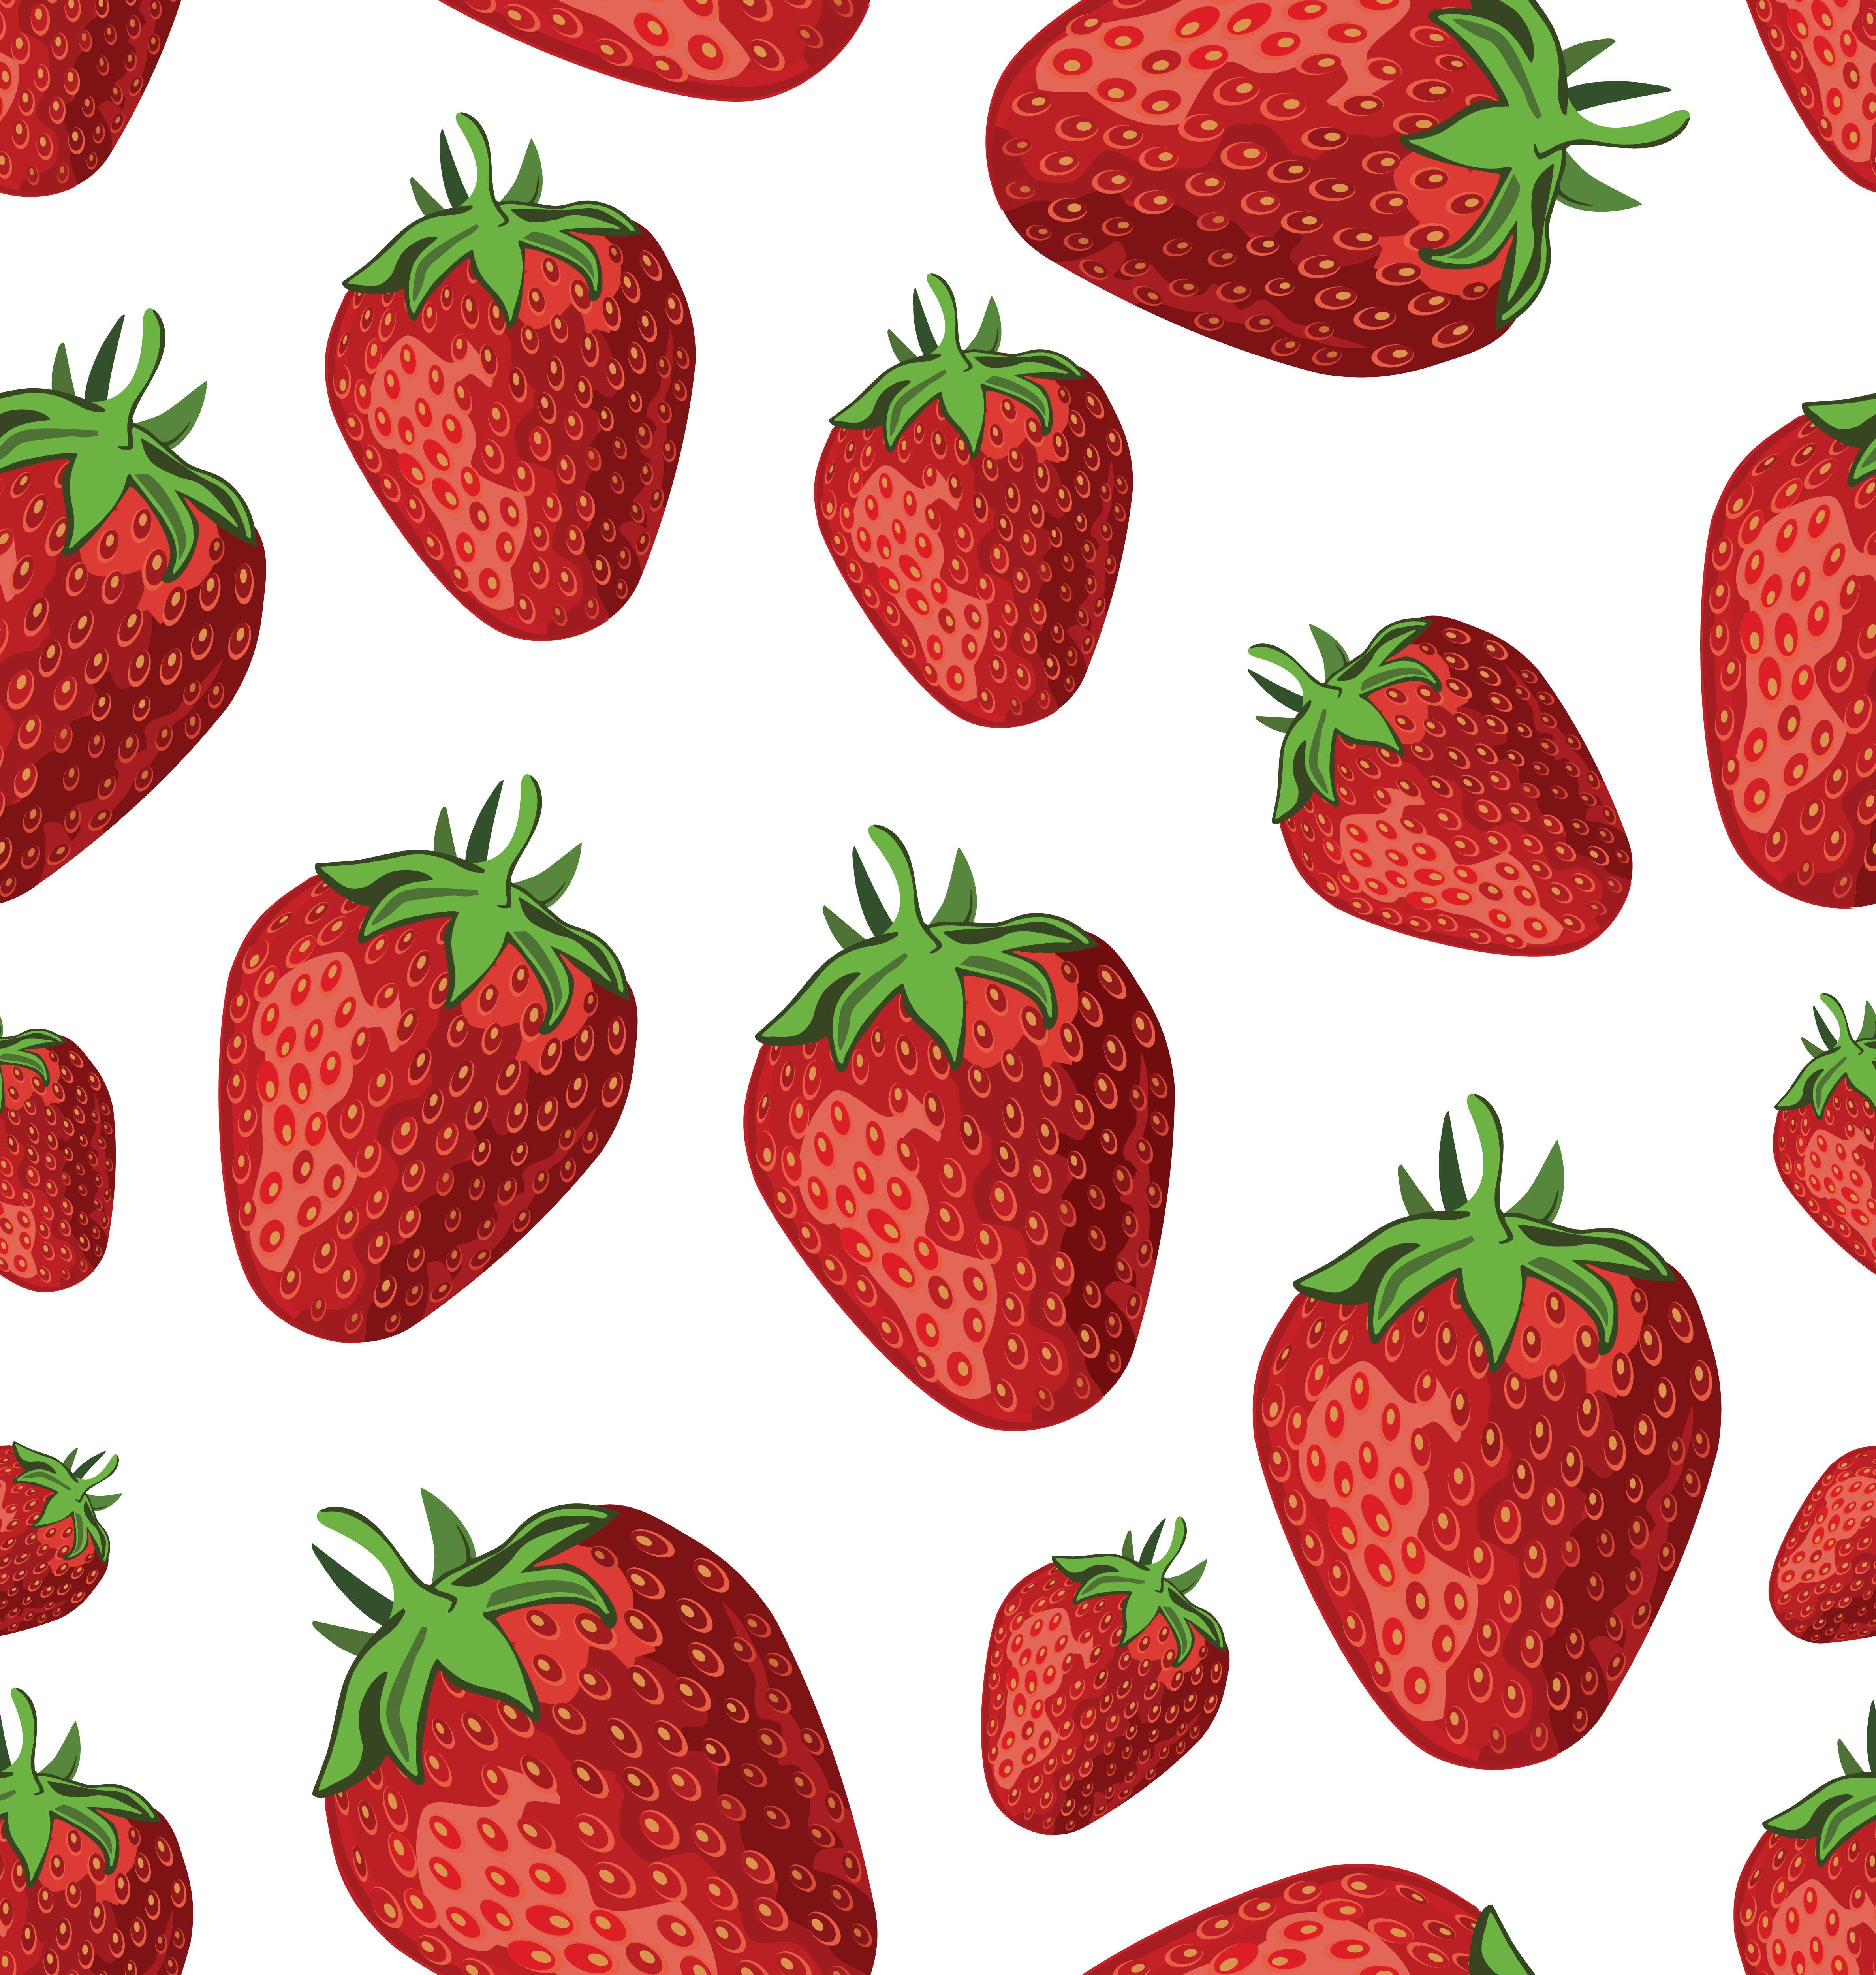 Strawberries Seamless Background